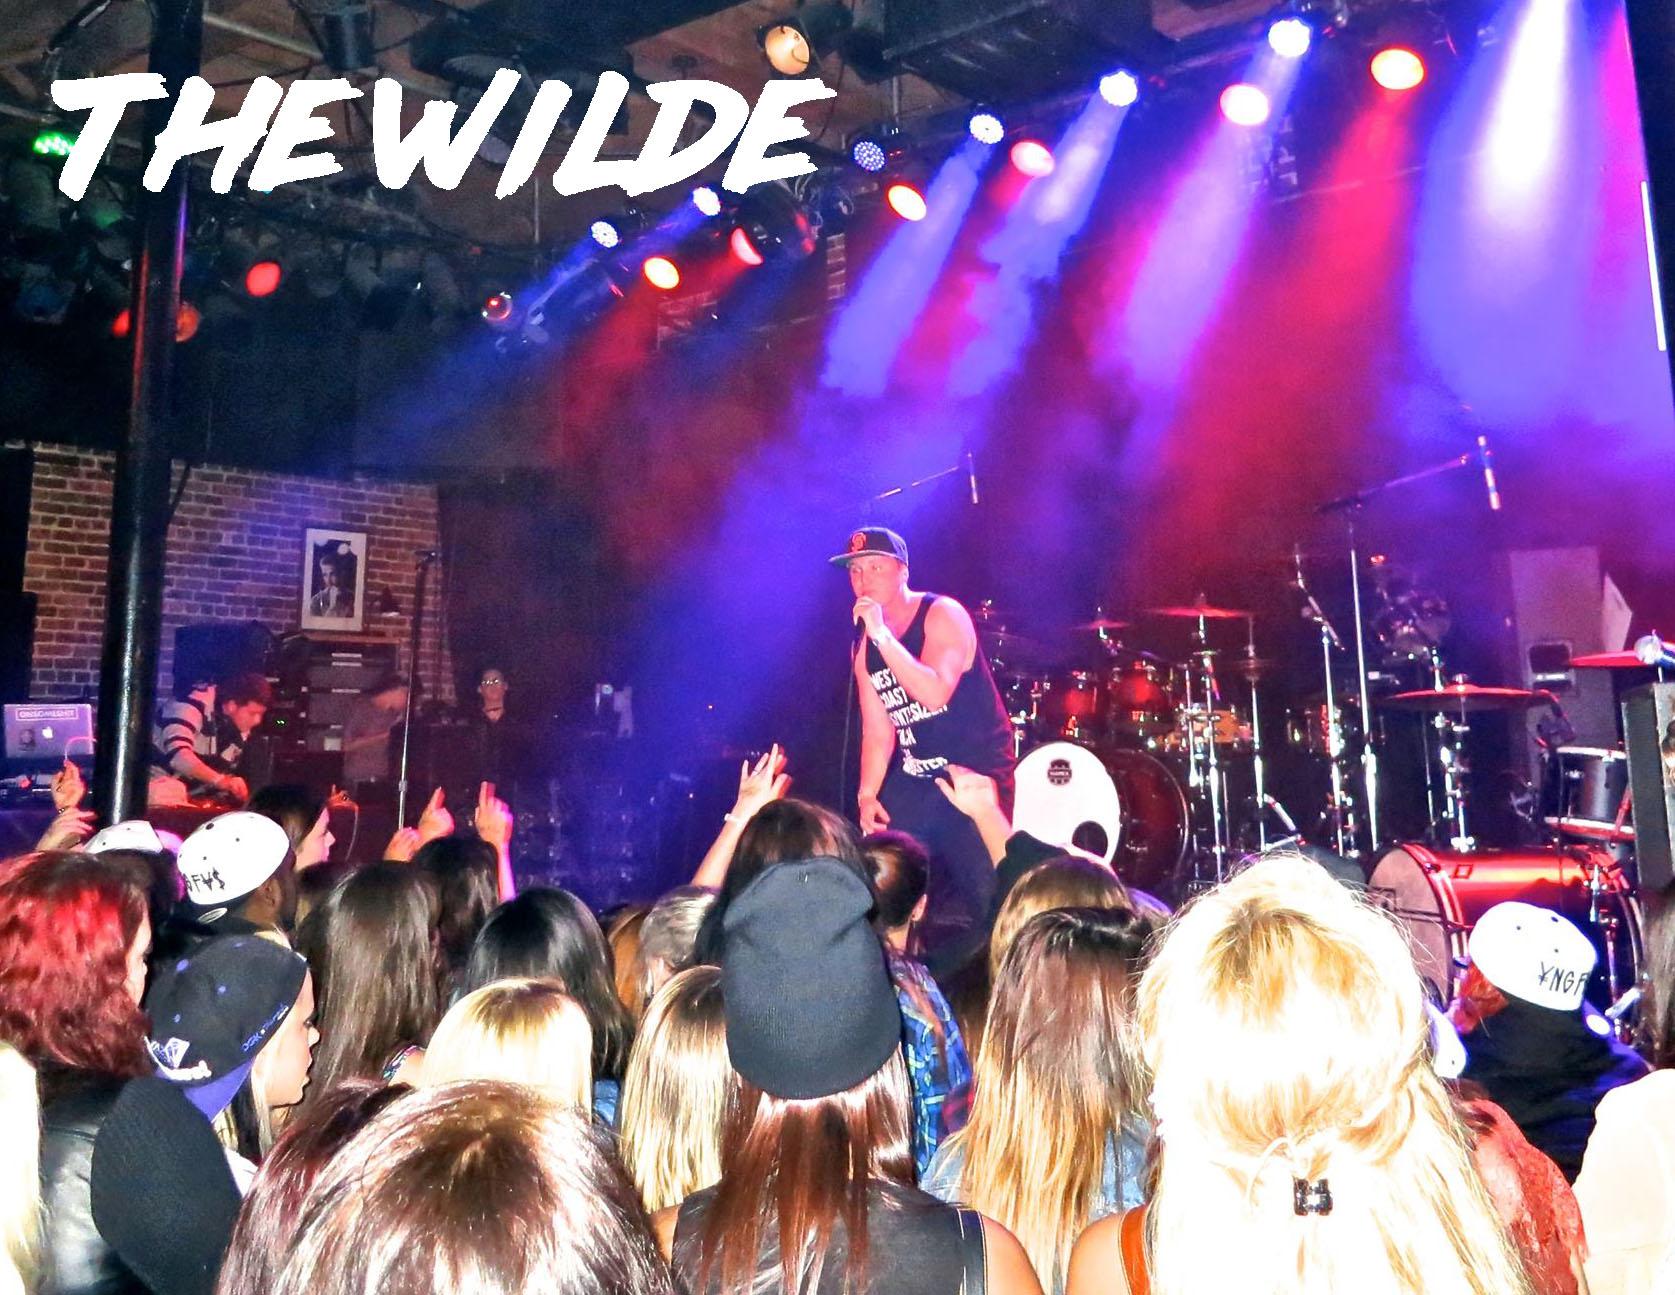 premiere-chemical aquarium-chemica aquarium by the wilde-the wilde-new music-indie music-hip hop-indie rap-music blog-wolfinasuit-indie-wolf in a suit